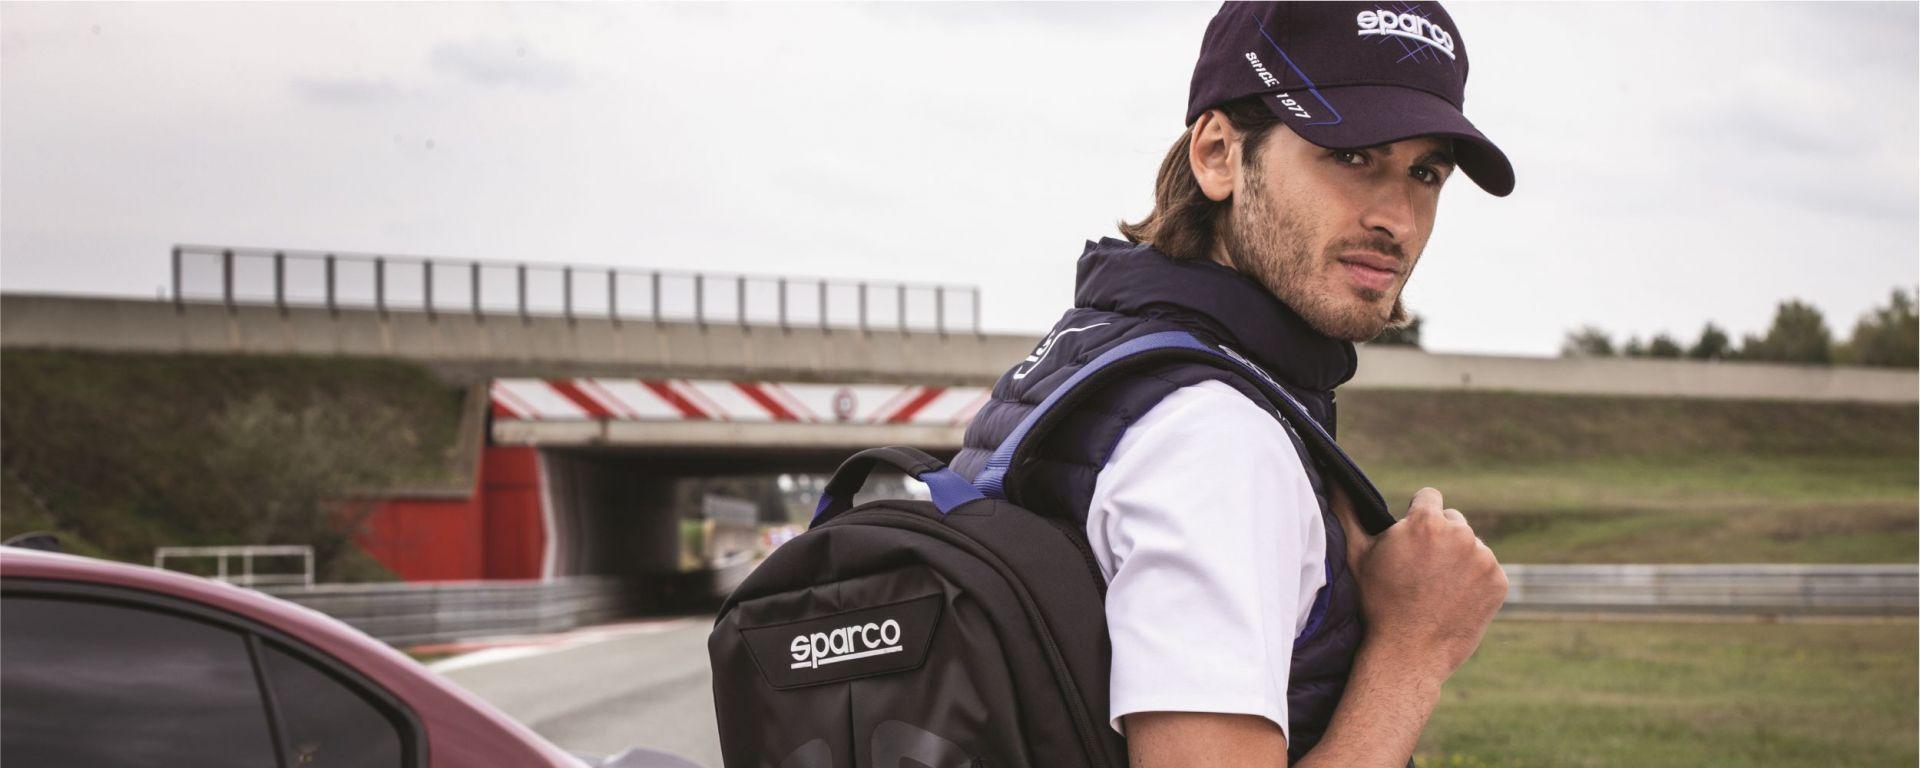 Antonio Giovinazzi testimonial di Sparco 2020